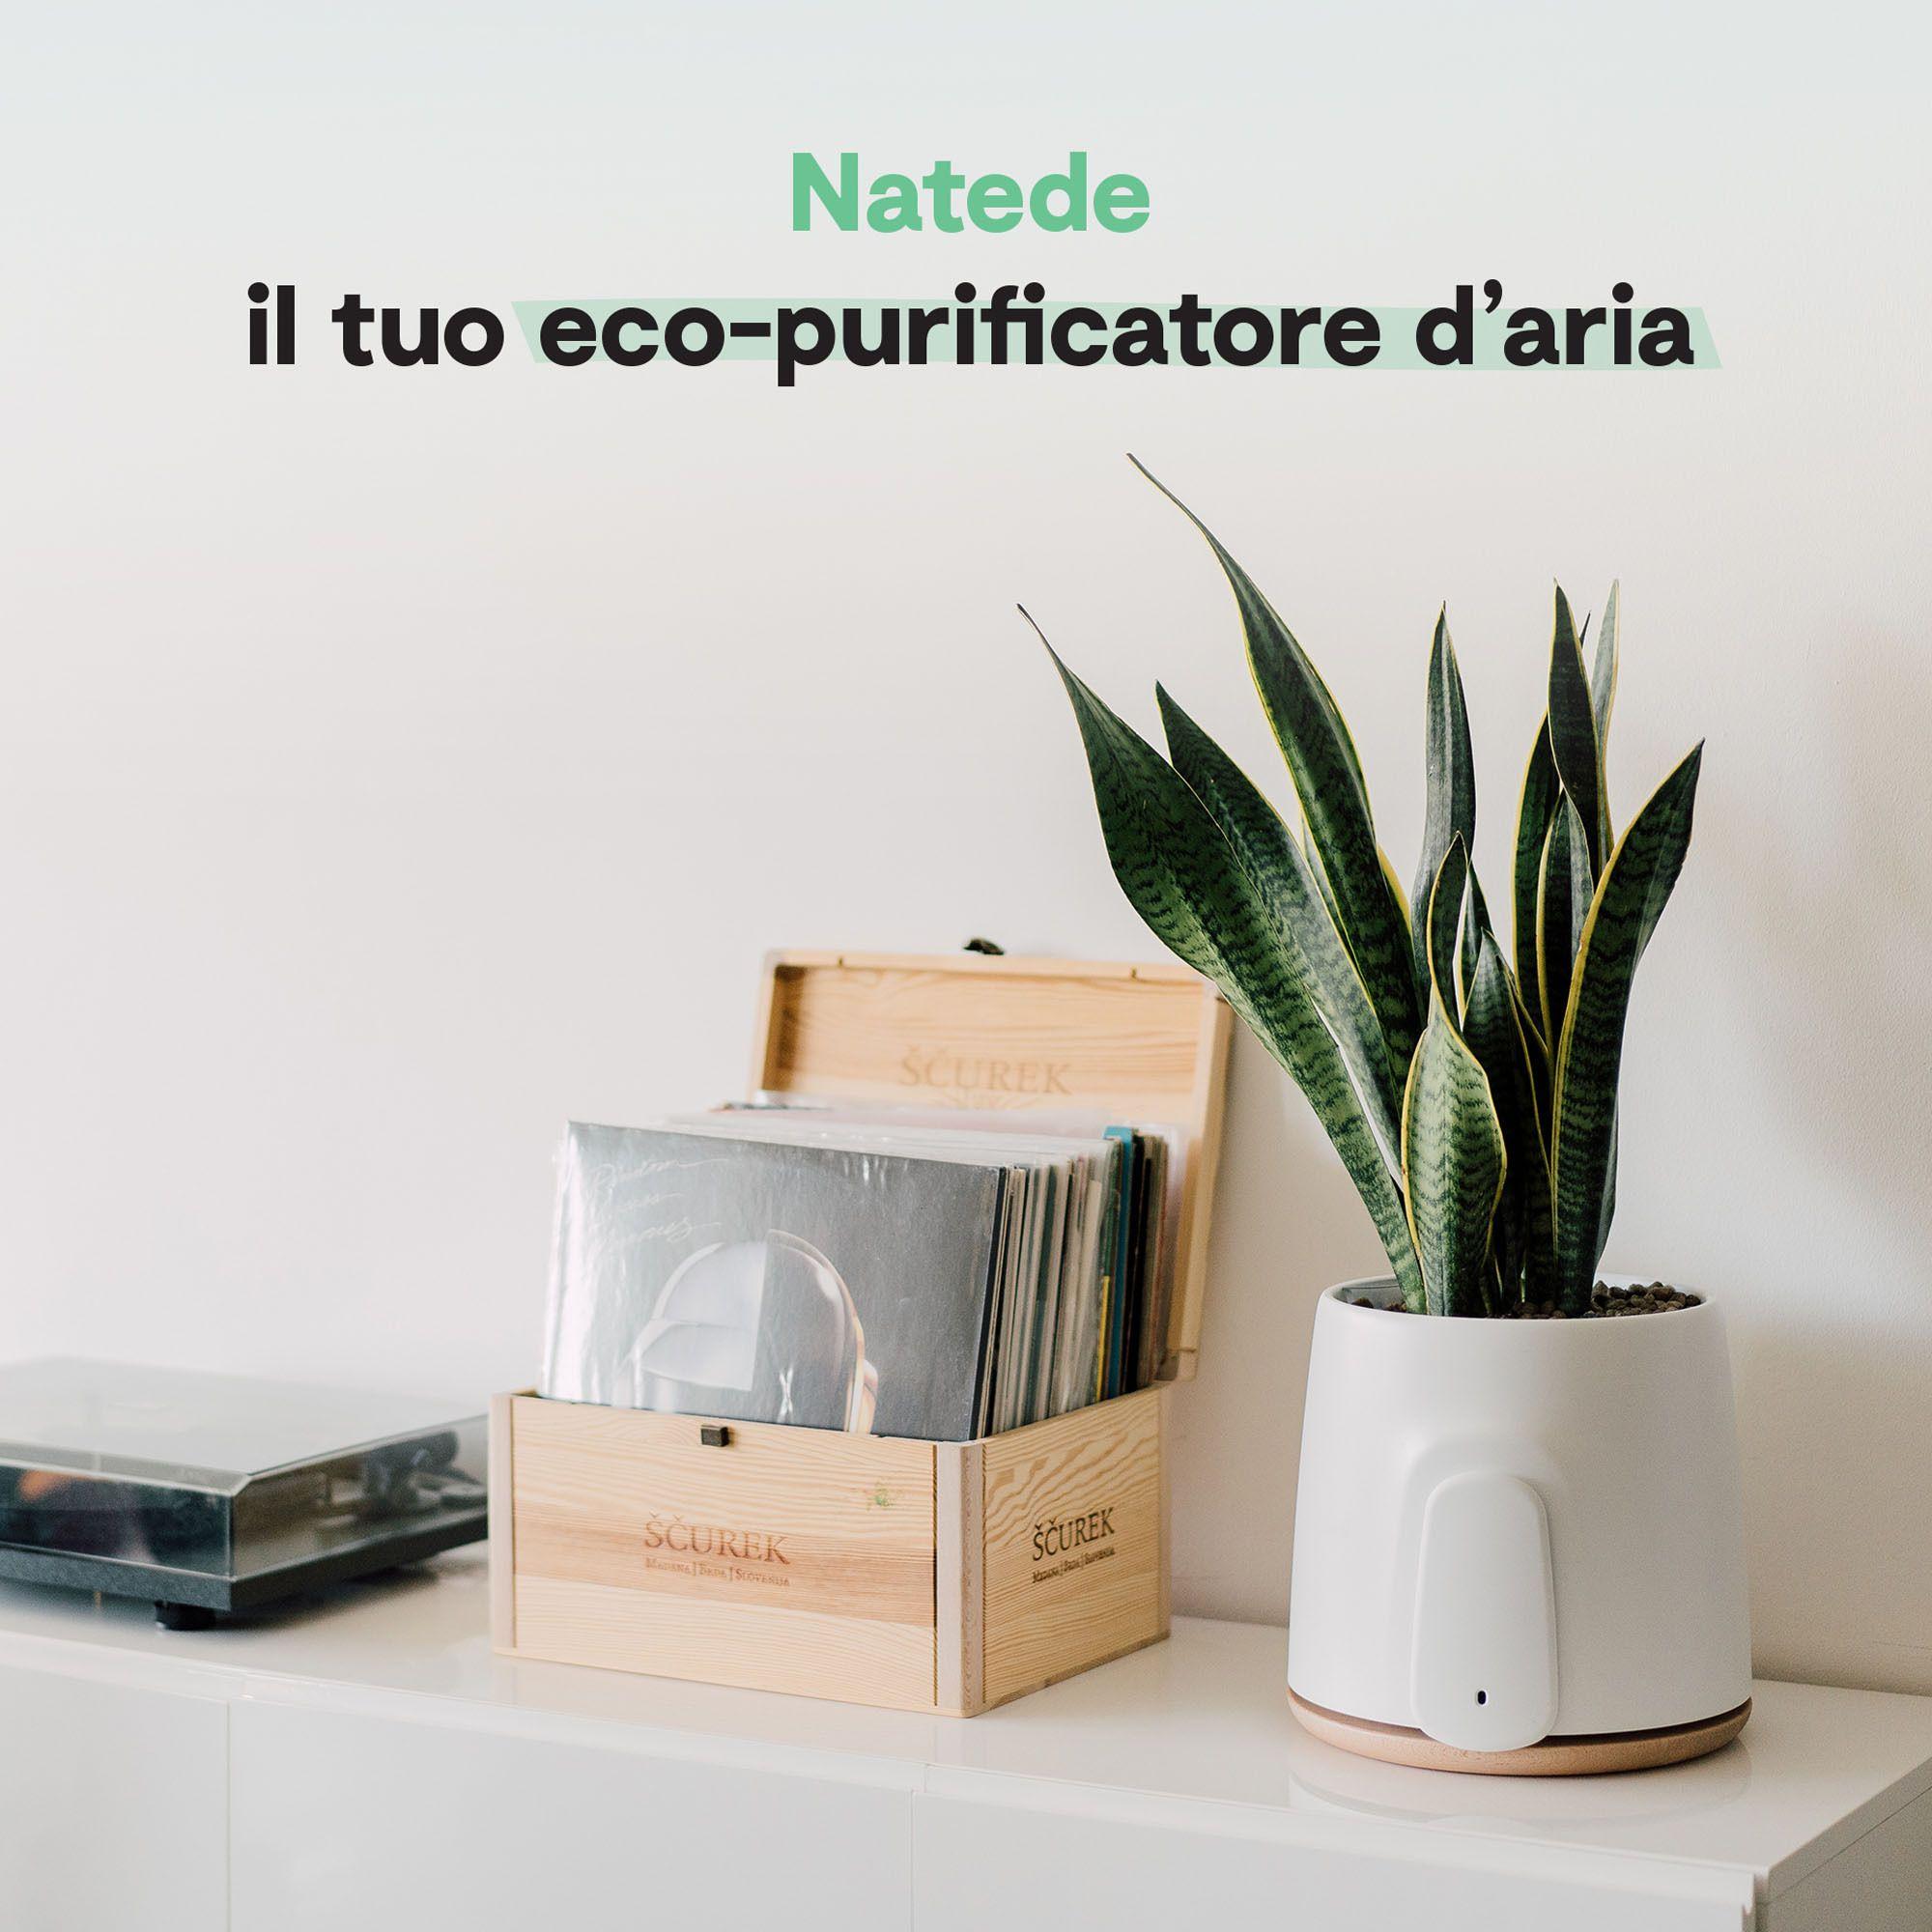 Natede purificatore d'aria naturale